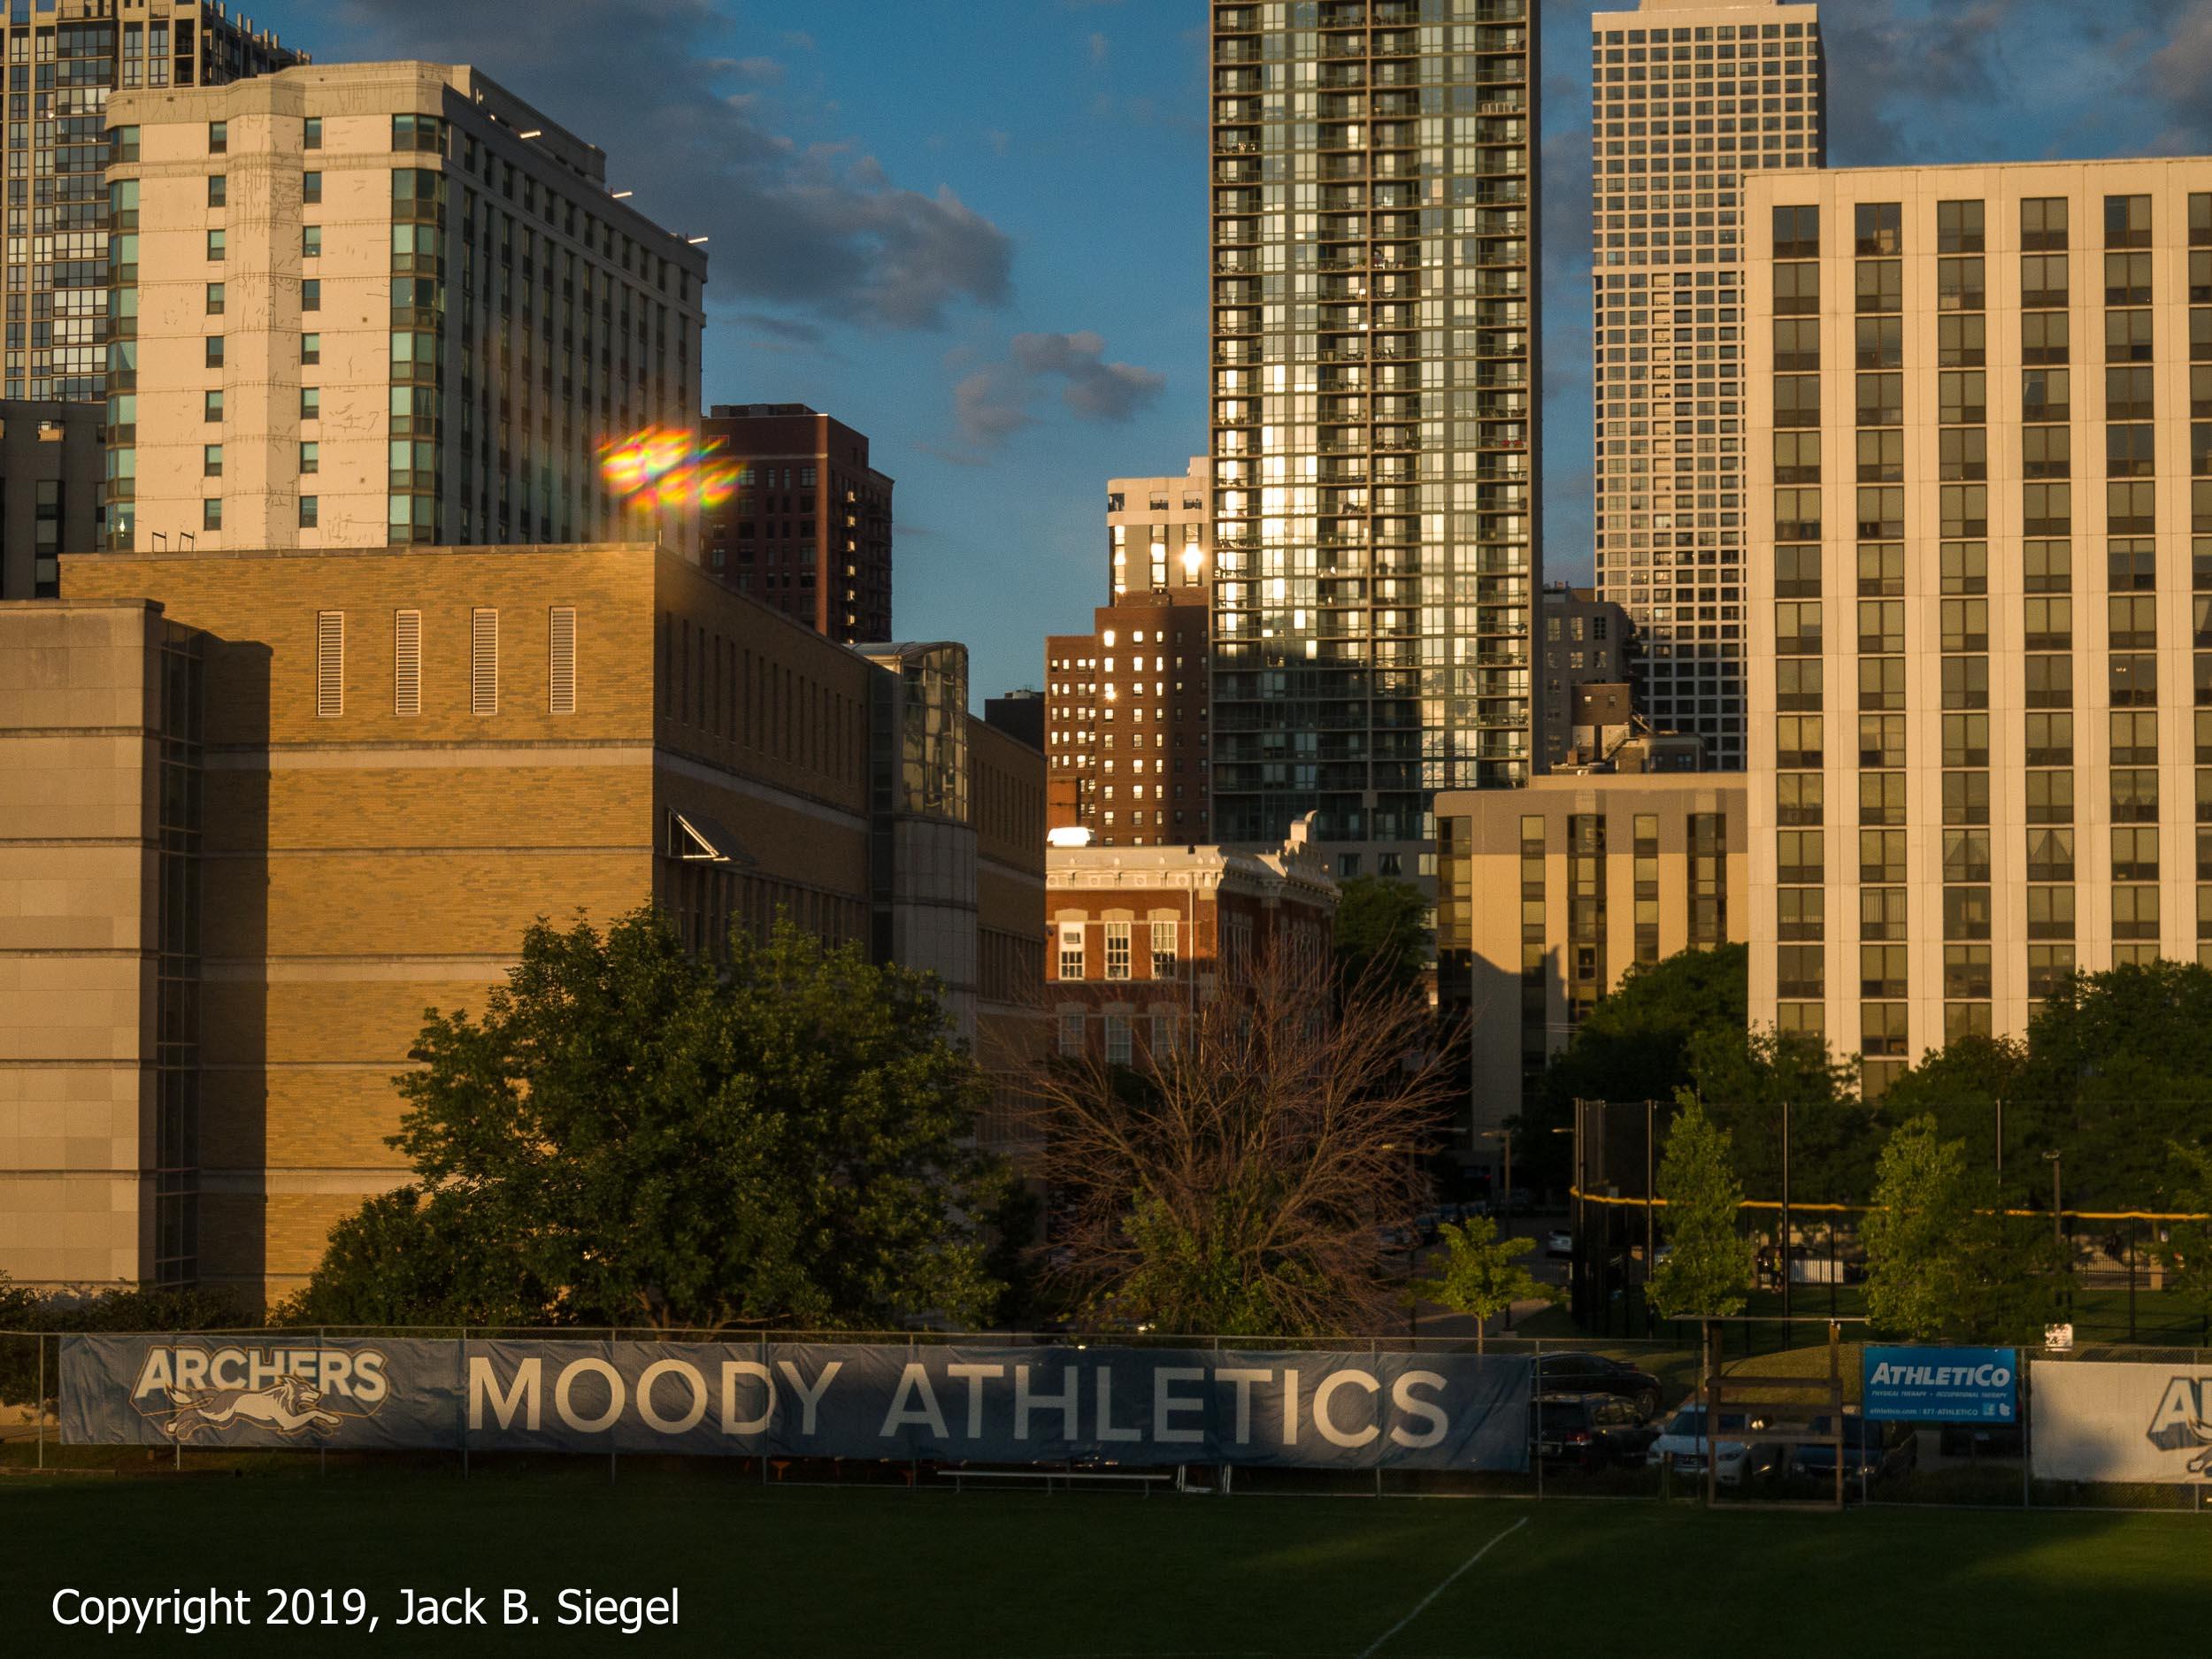 Moody Skies and Athletics